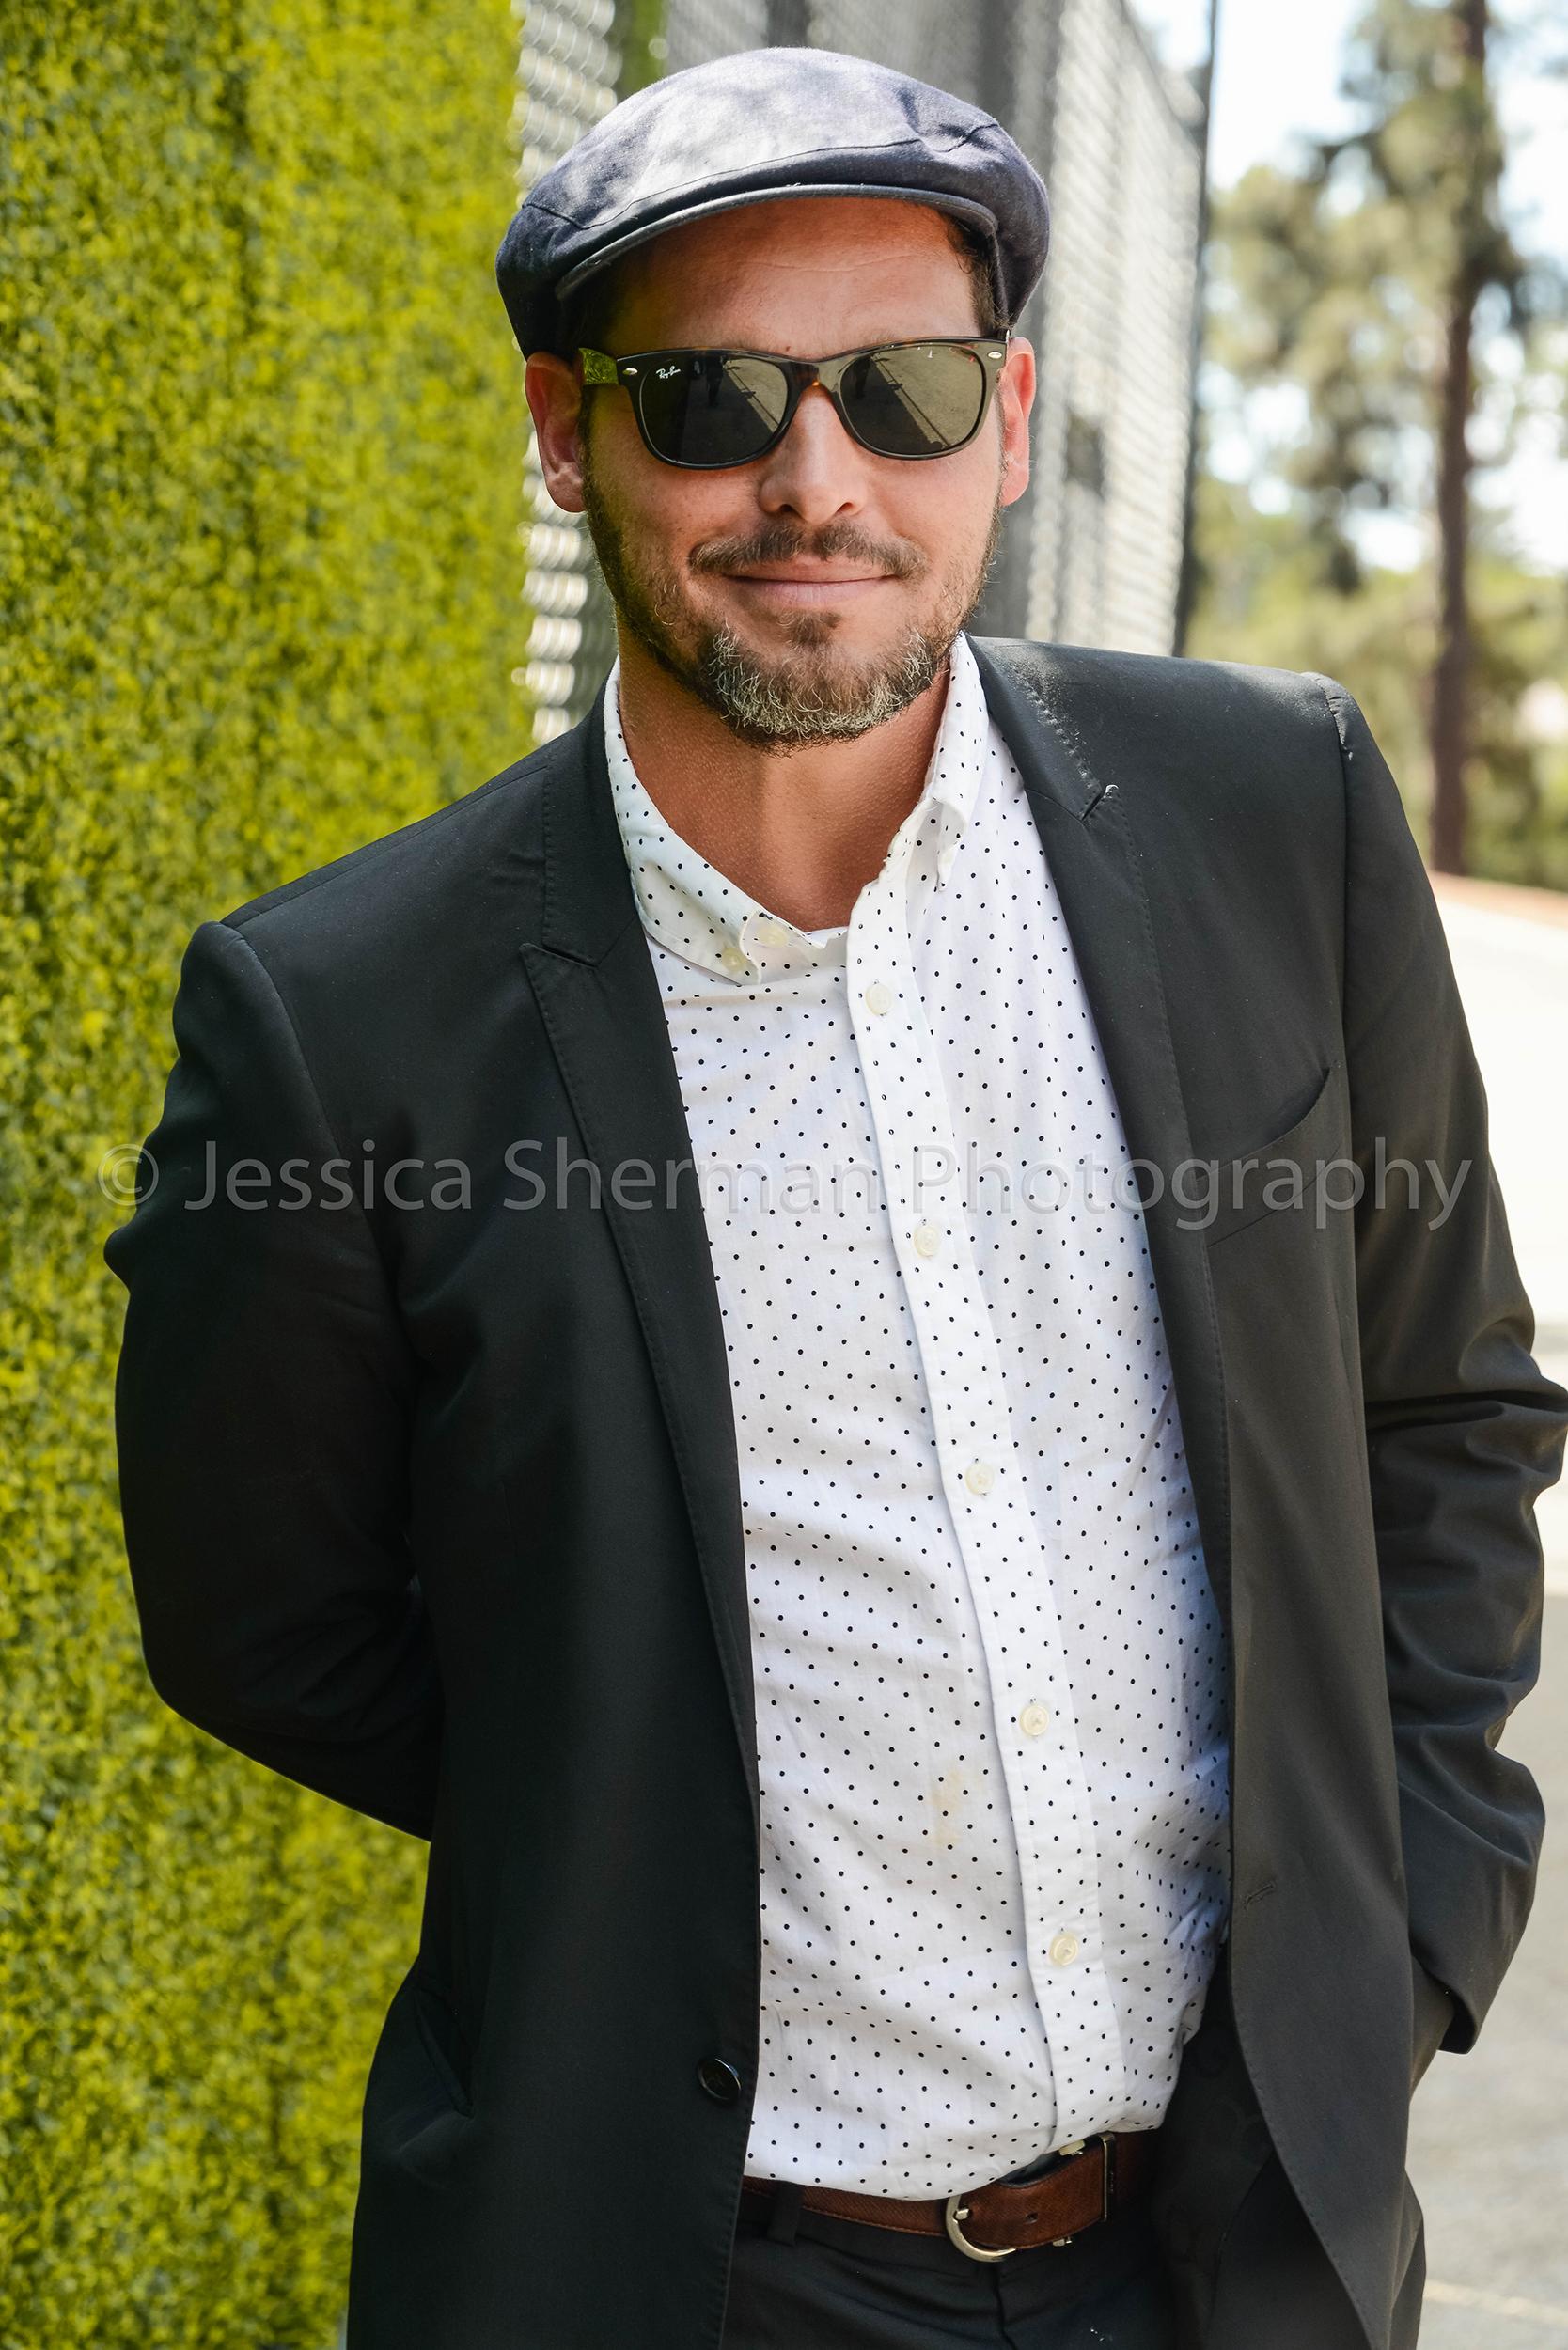 Justin-Chambers-Jessica-Sherman-8951-WEB.jpg